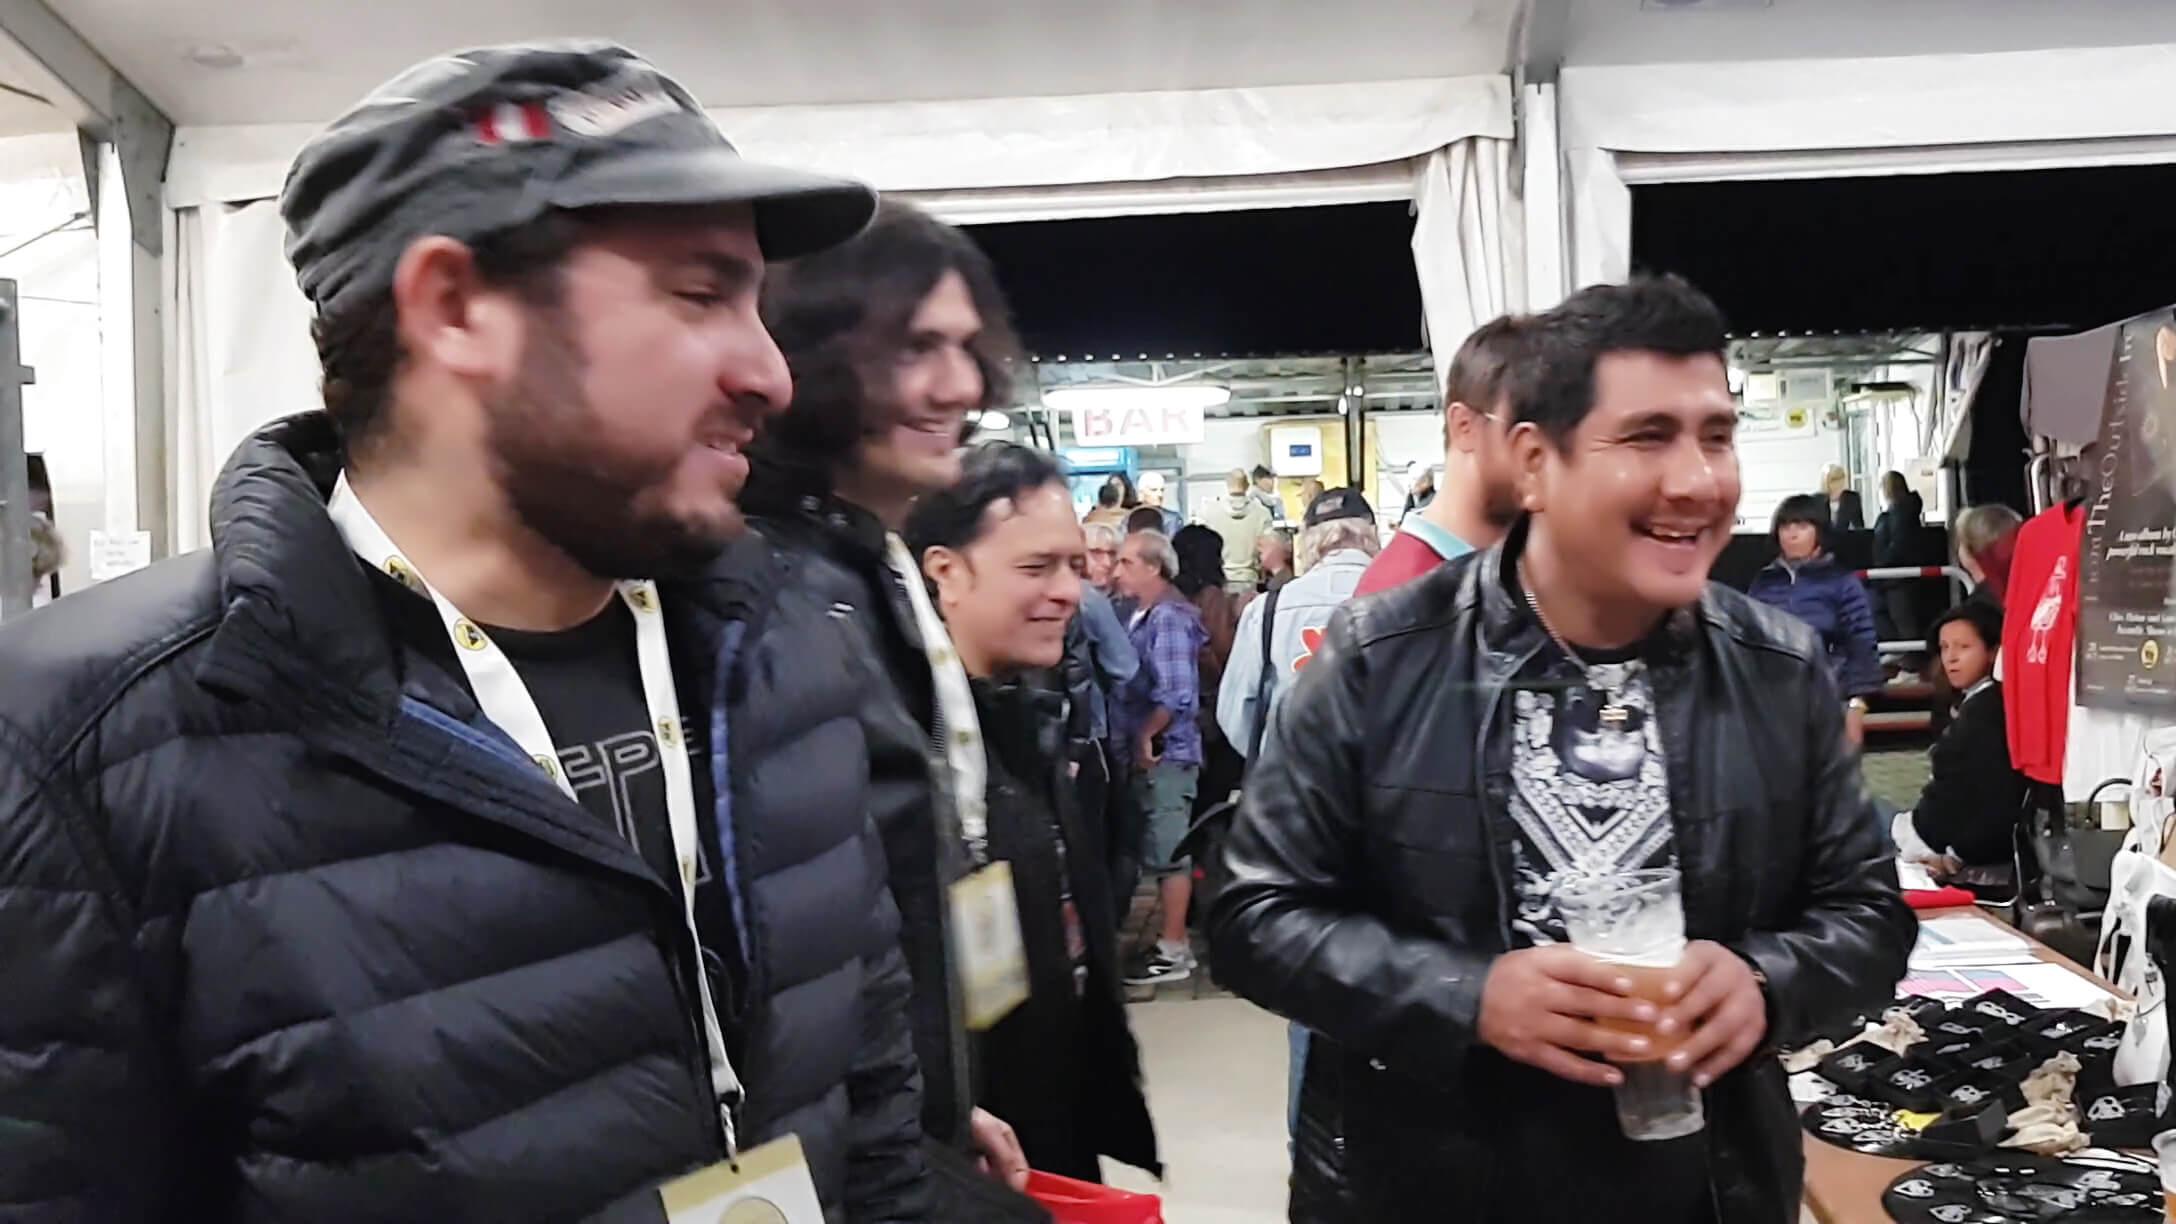 2Days Prog + 1 Festival Flor de Loto, Olivia Hadjiioannou, Oh. Metallia Veruno Italy